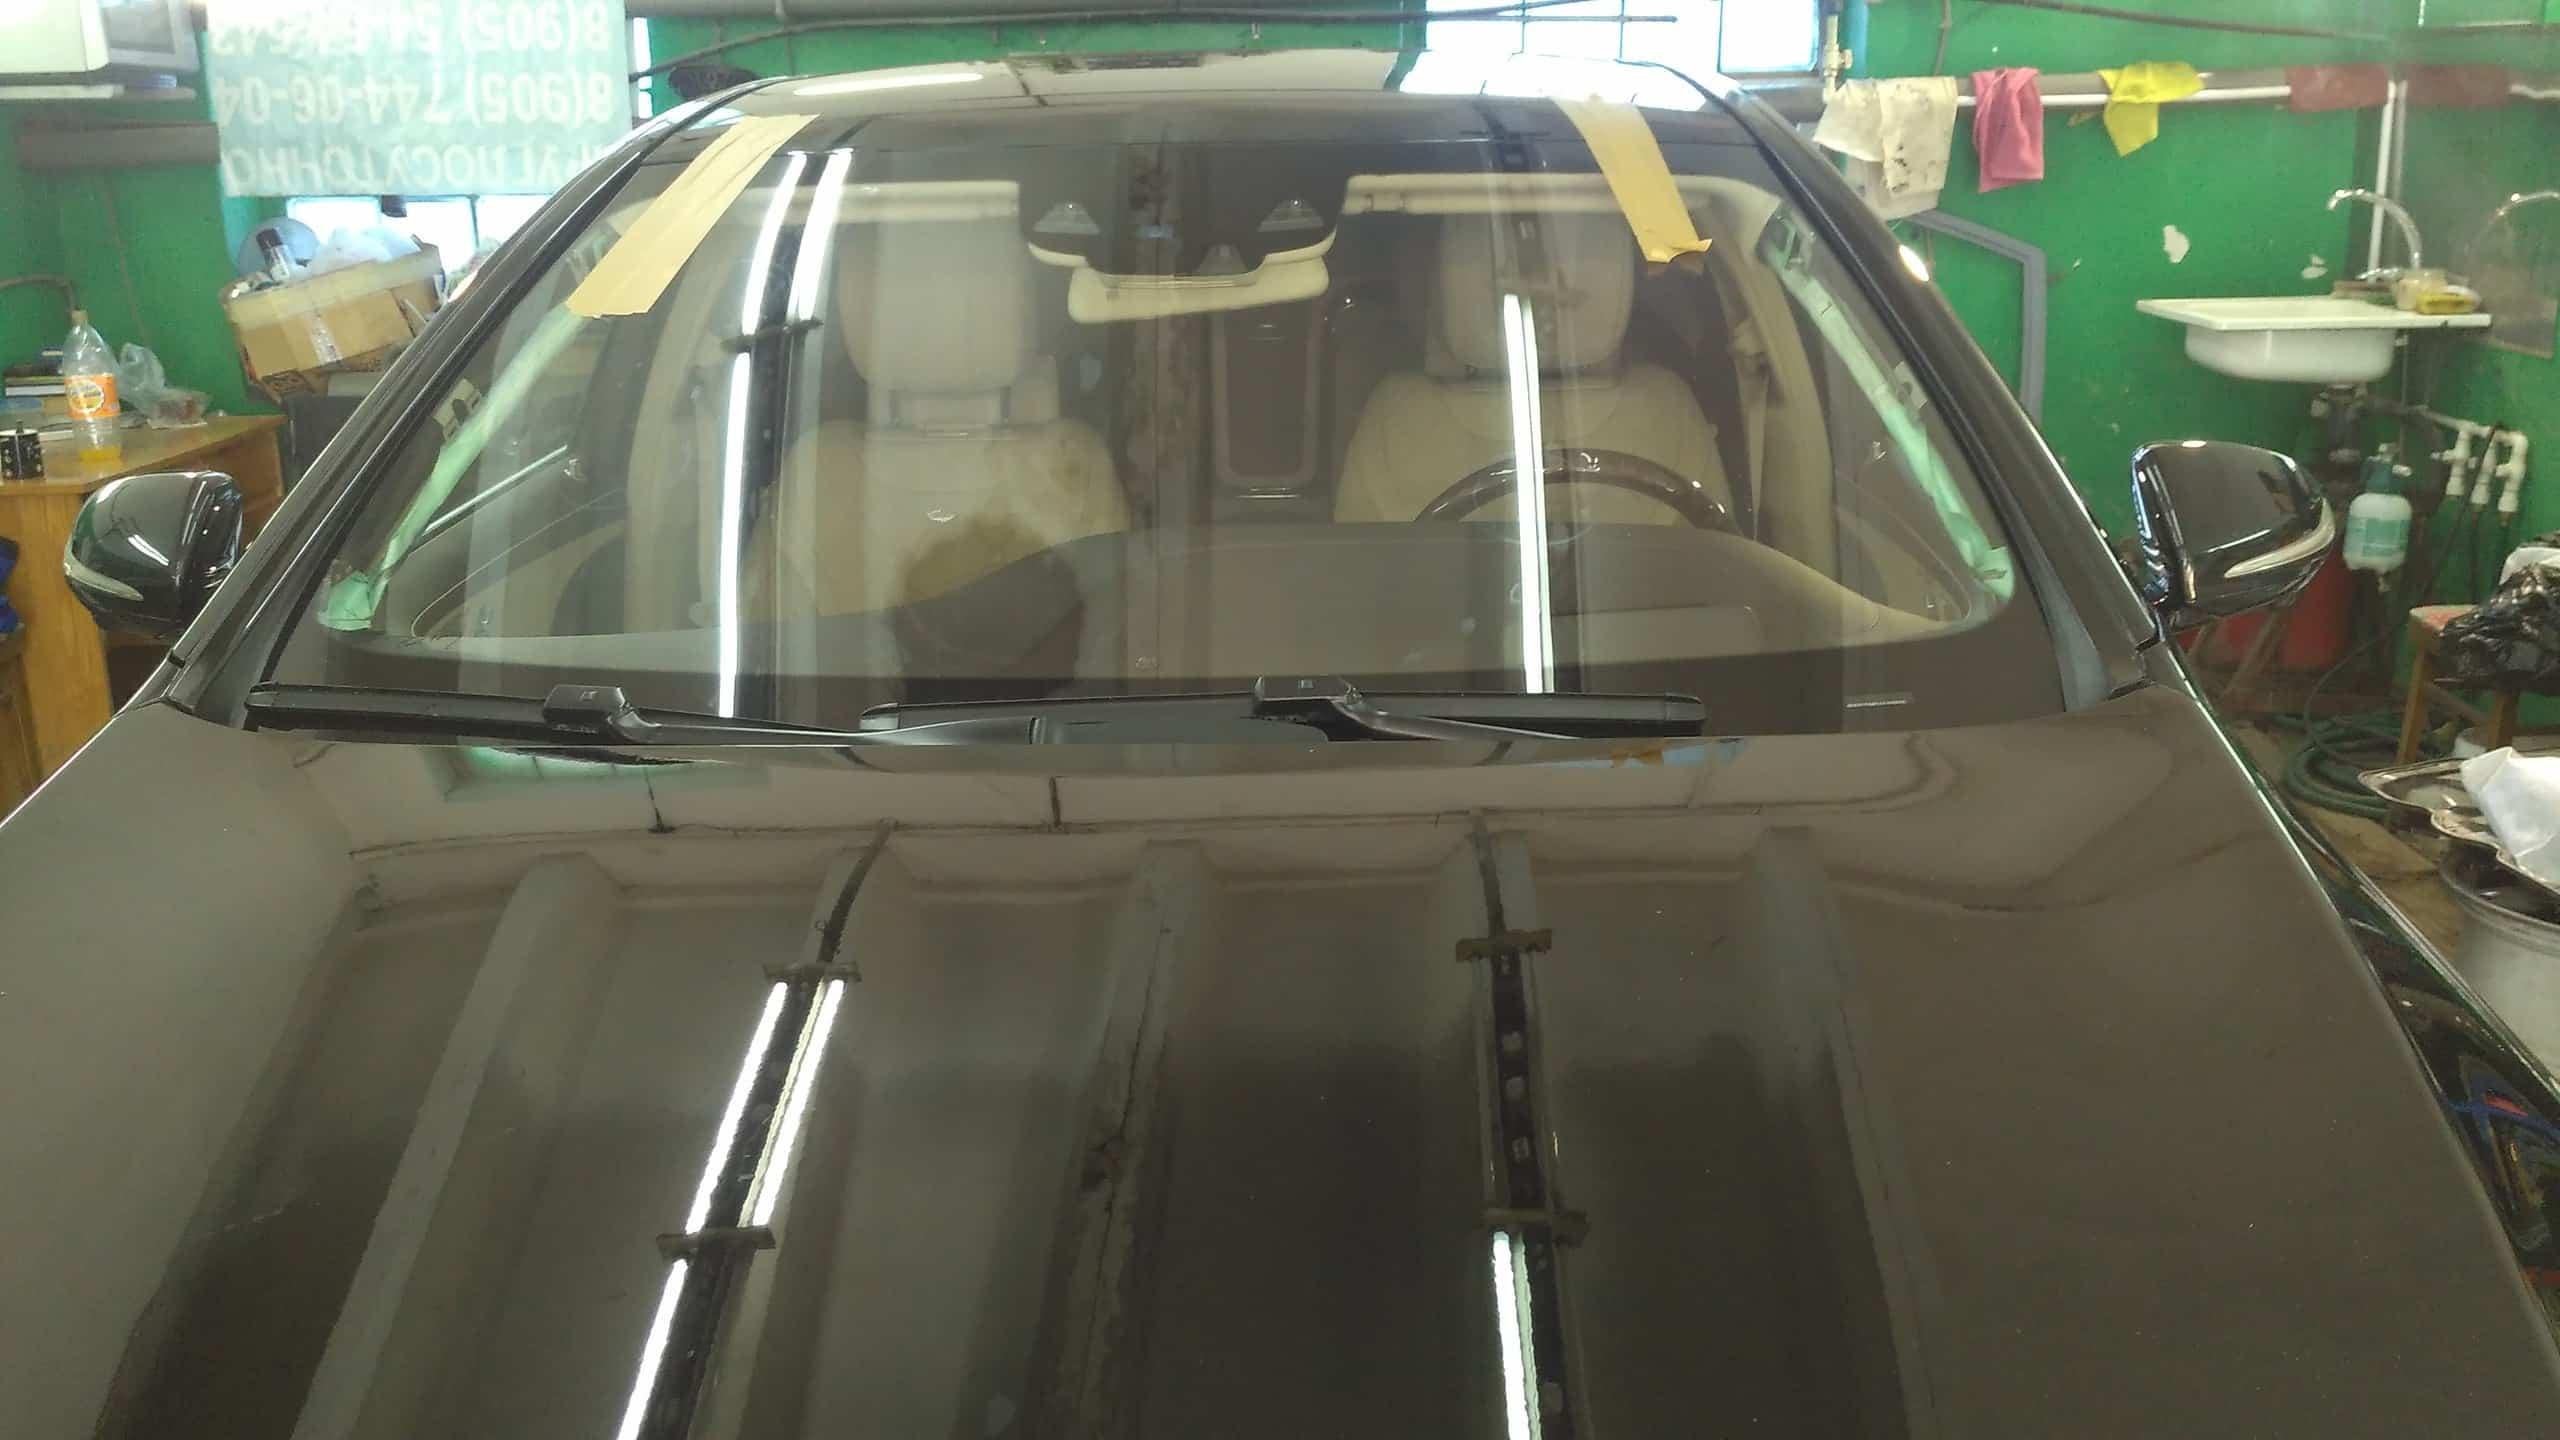 ktGliW7tejI1 - Замена переднего и заднего стекла